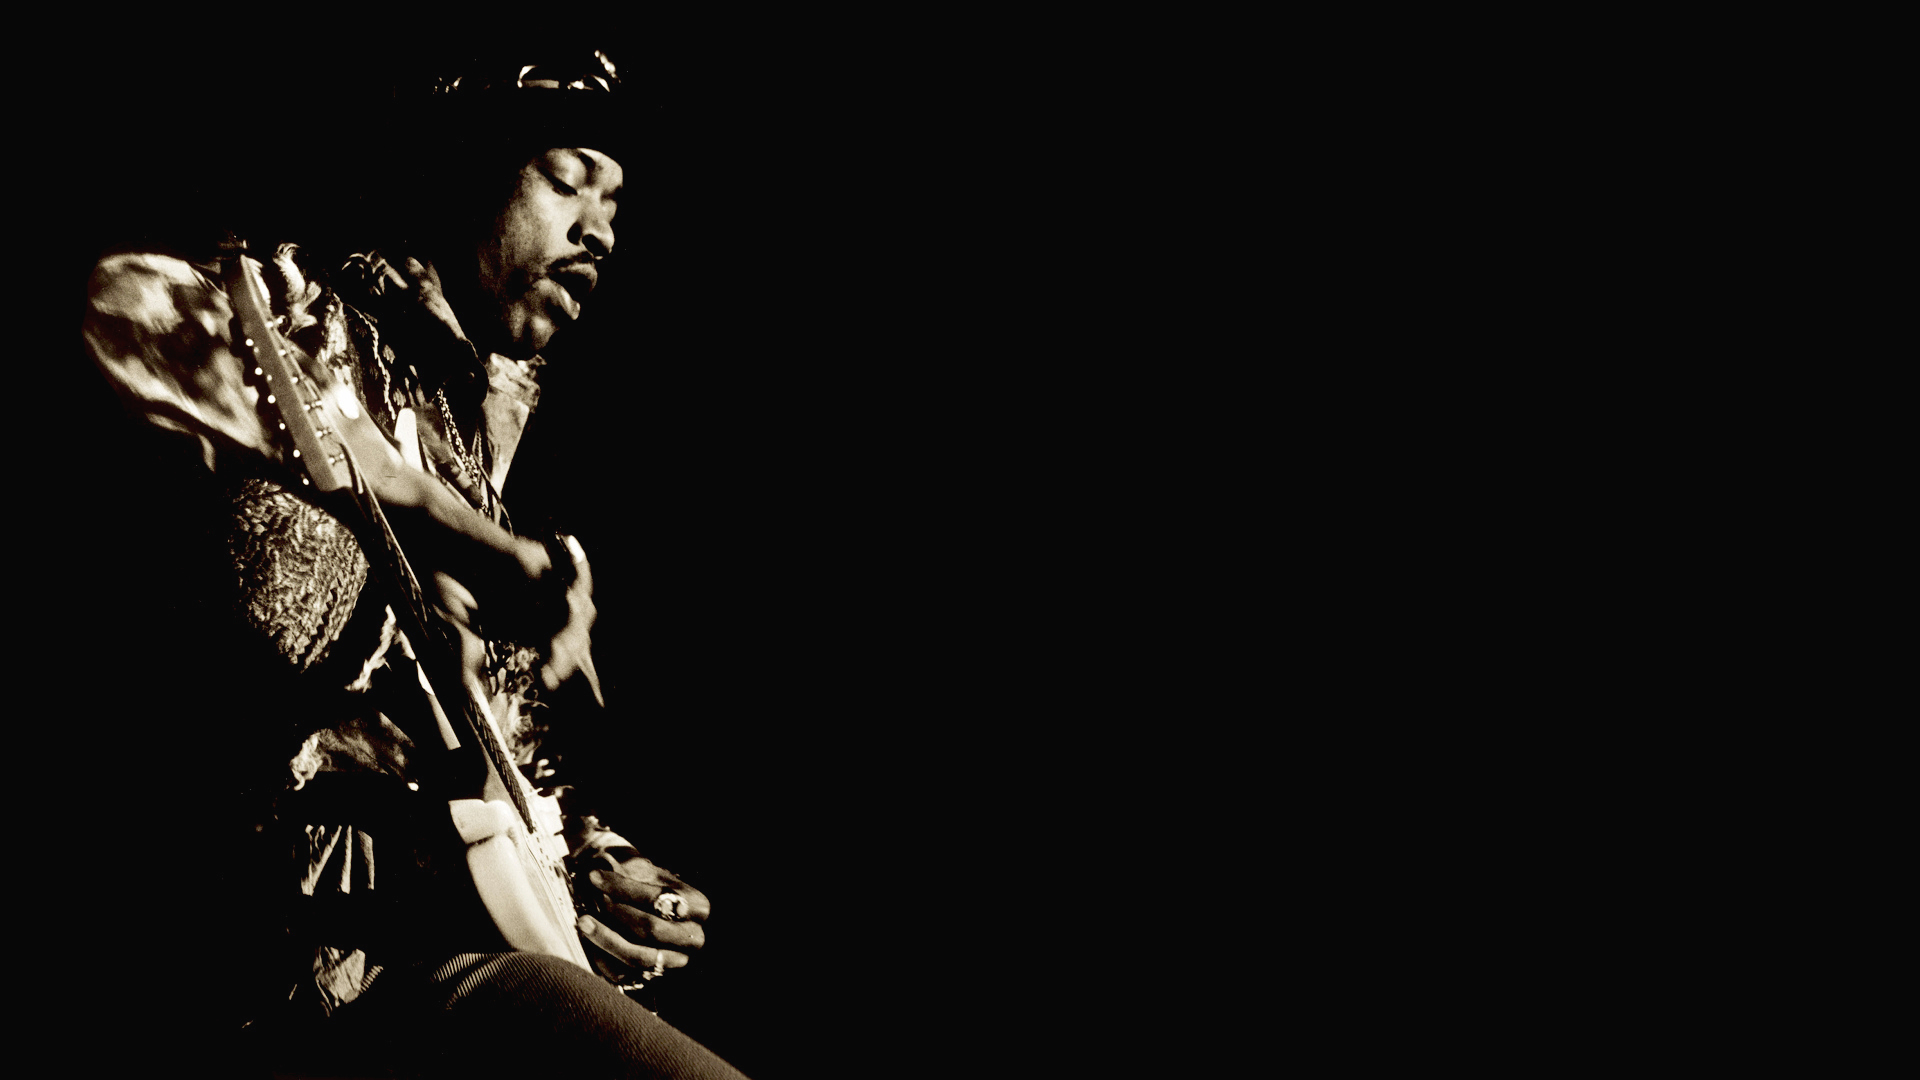 Jimi Hendrix HD Wallpaper | Background Image | 1920x1080 ...